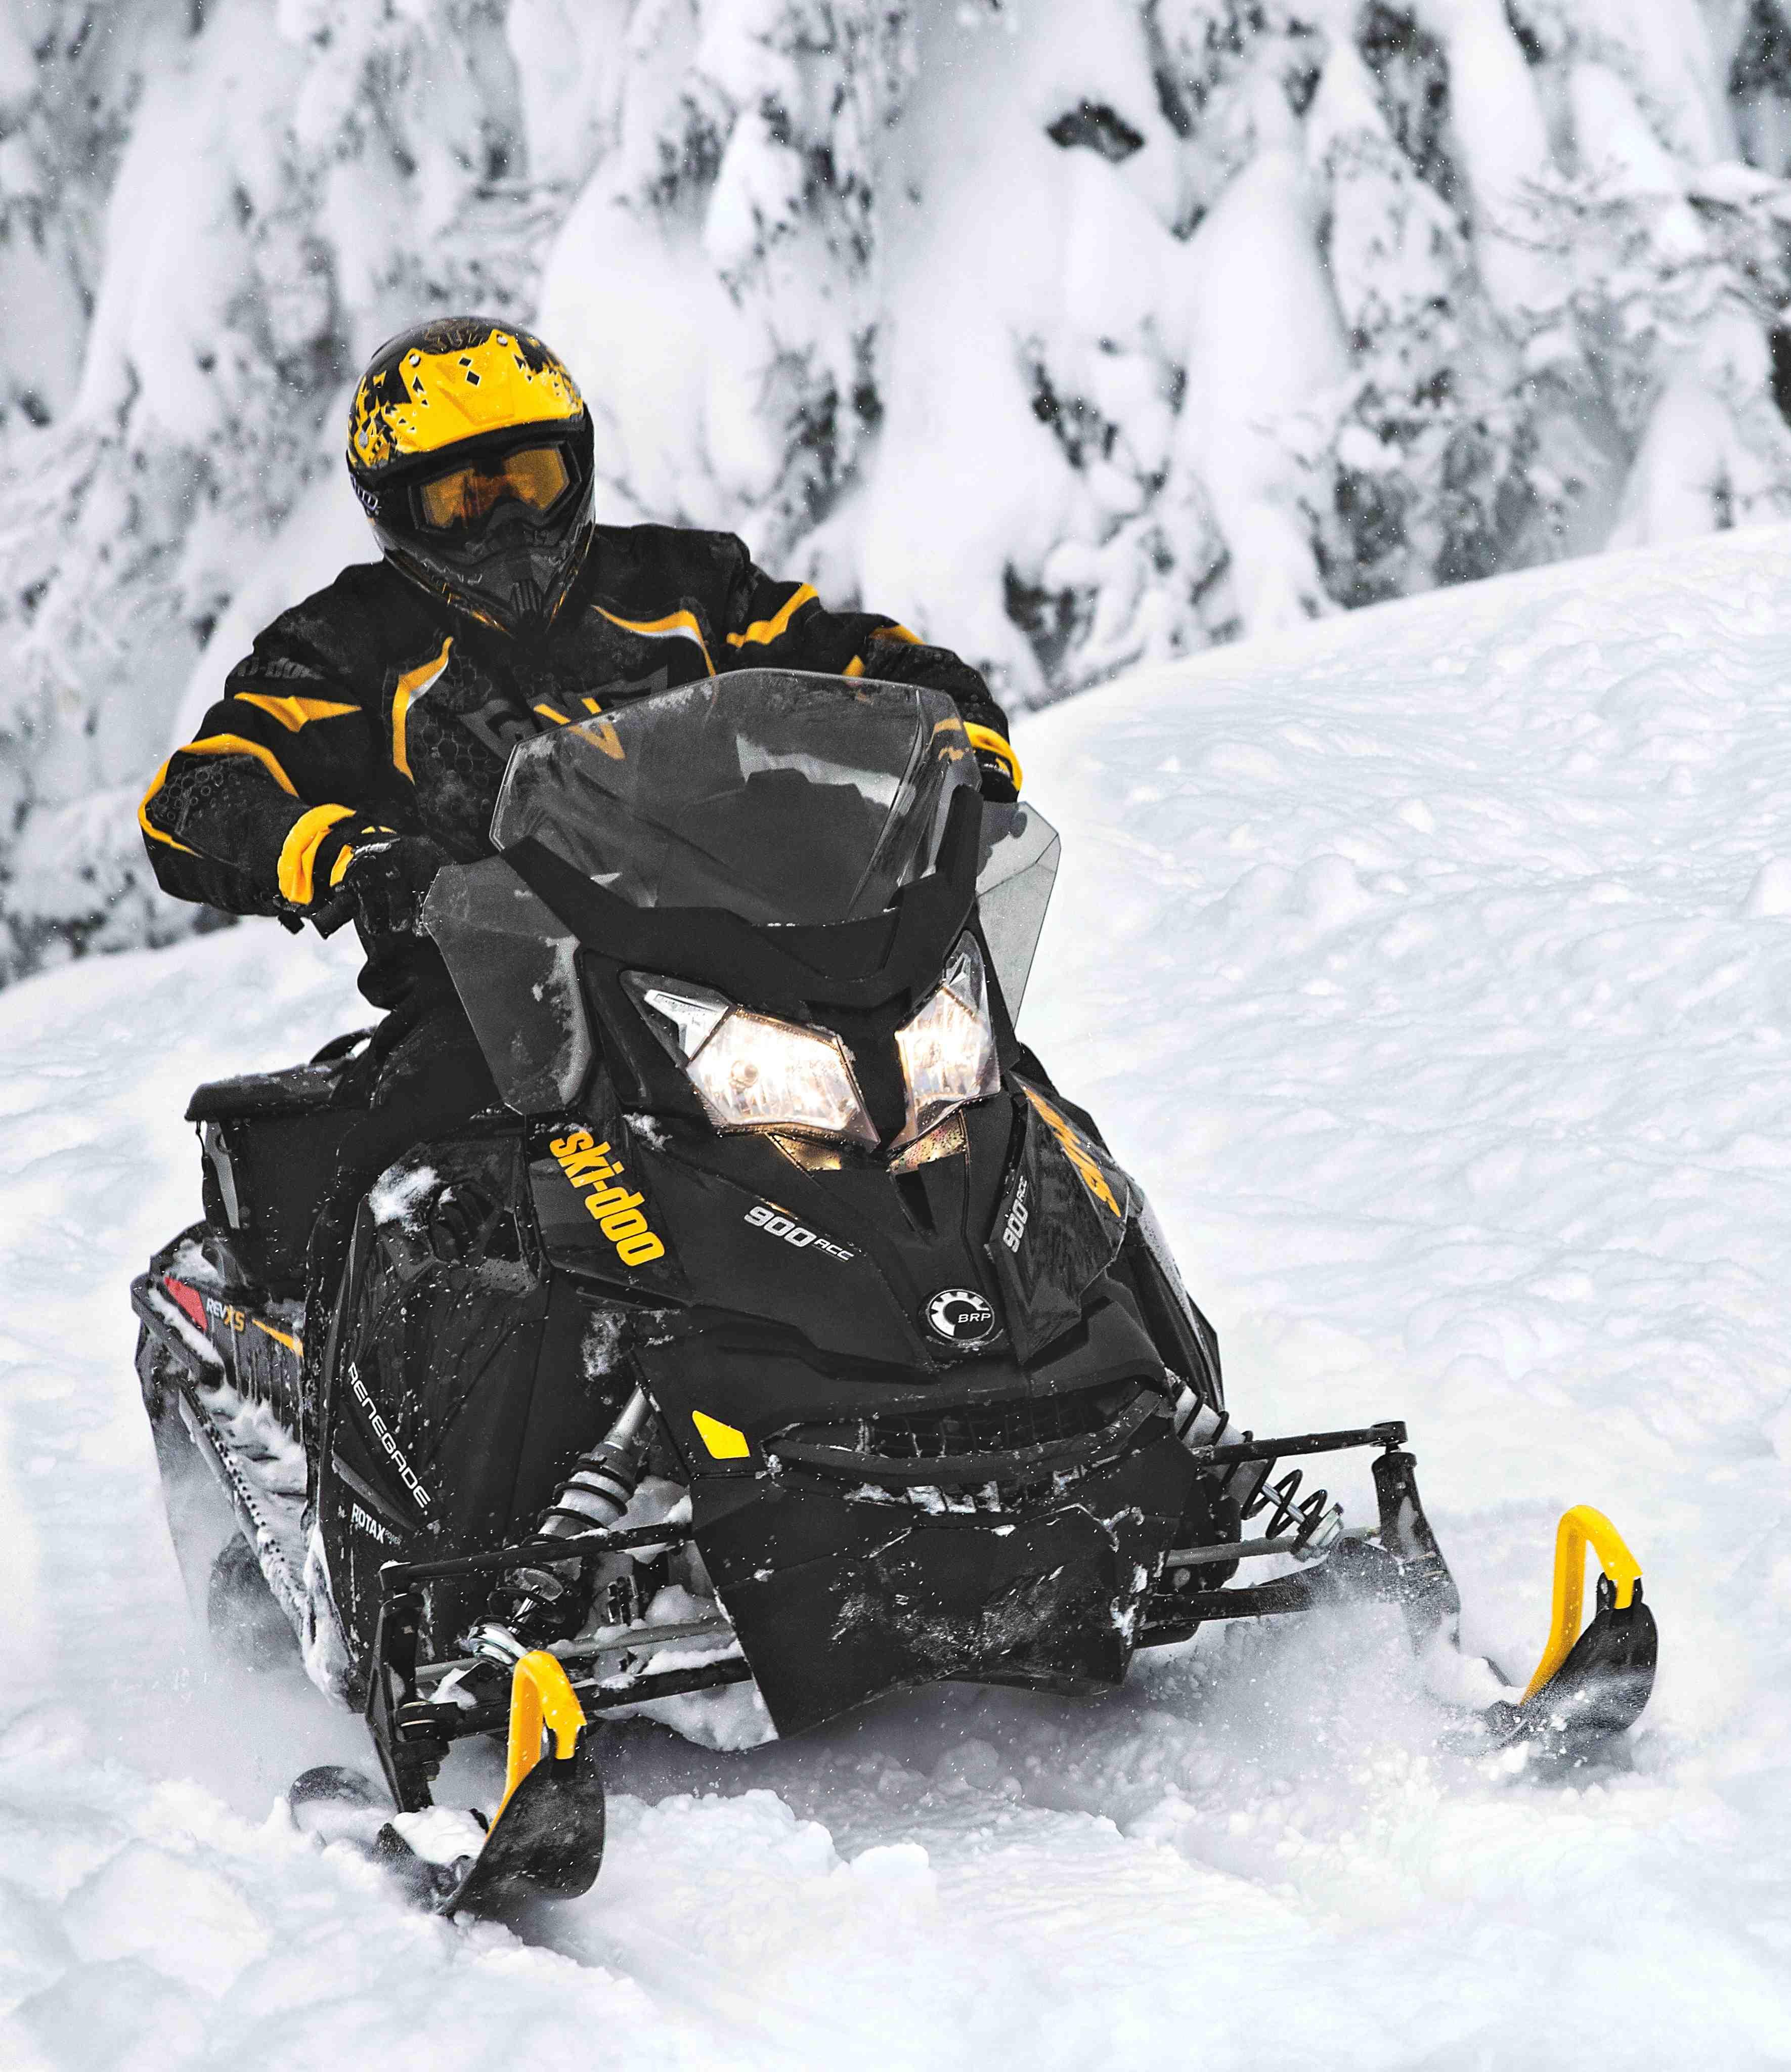 Ski Doo Renegade Adrenaline Product Review